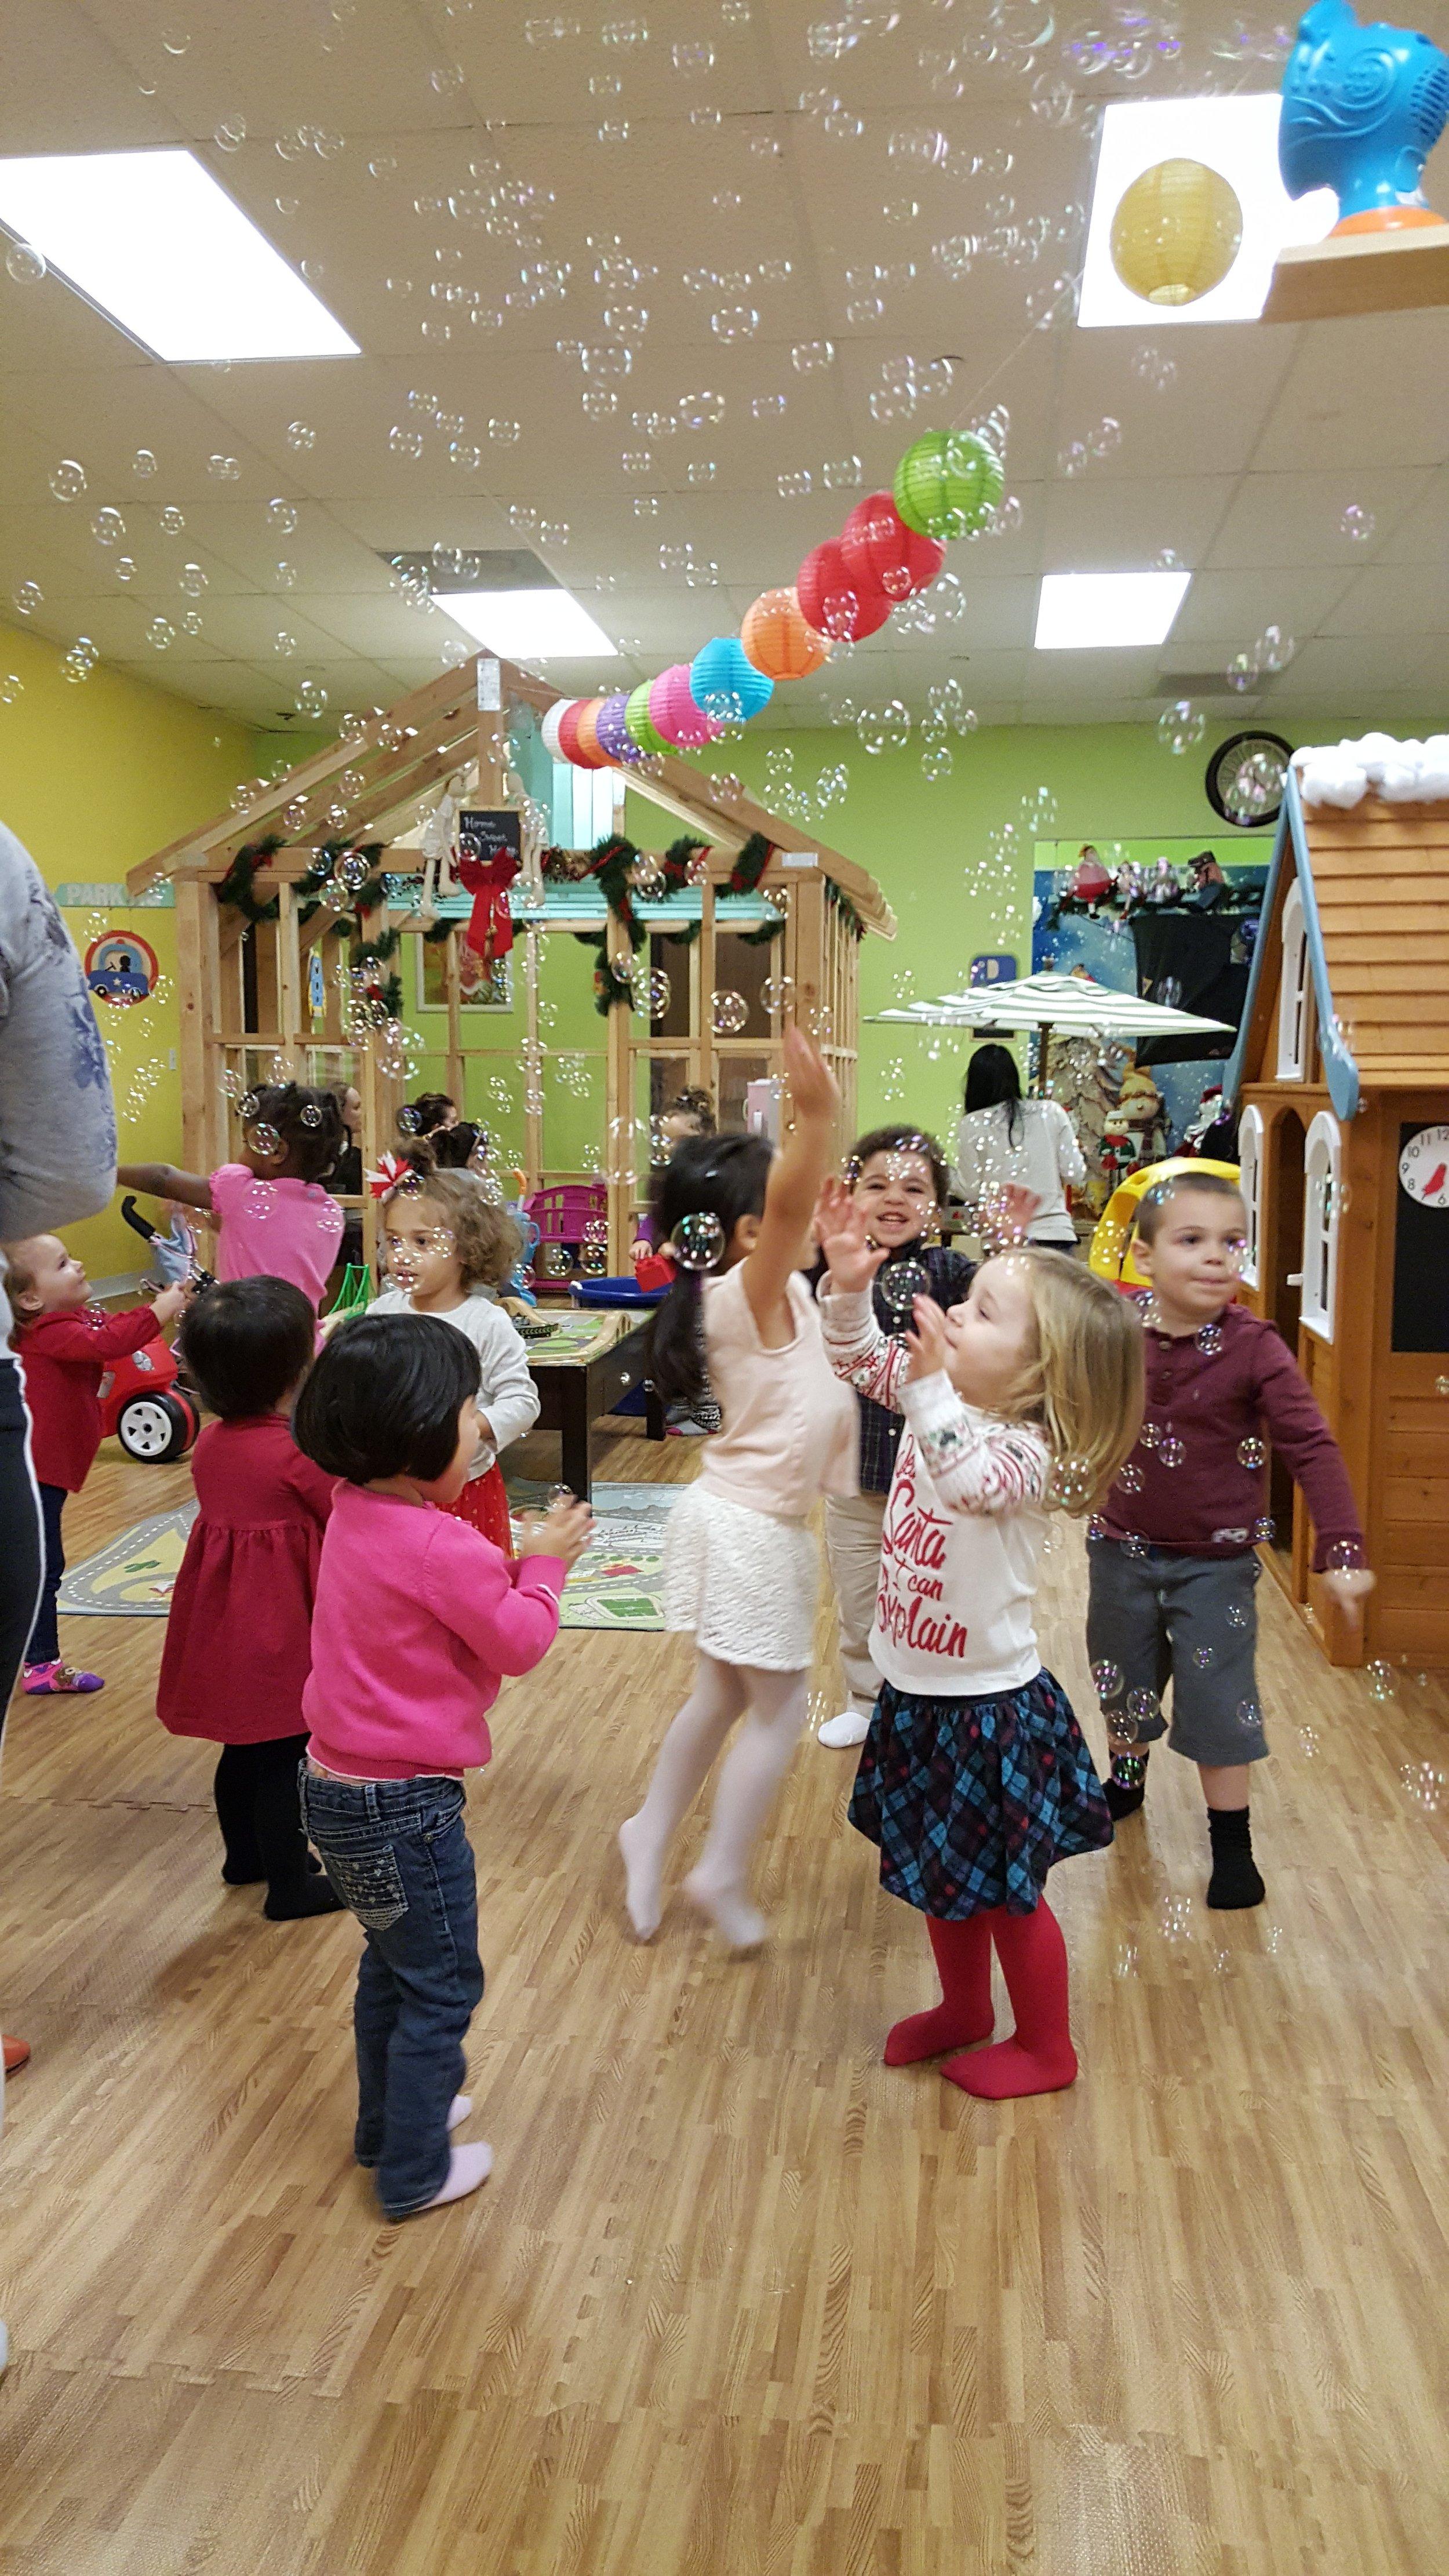 Party Activity - BUBBLE TIME